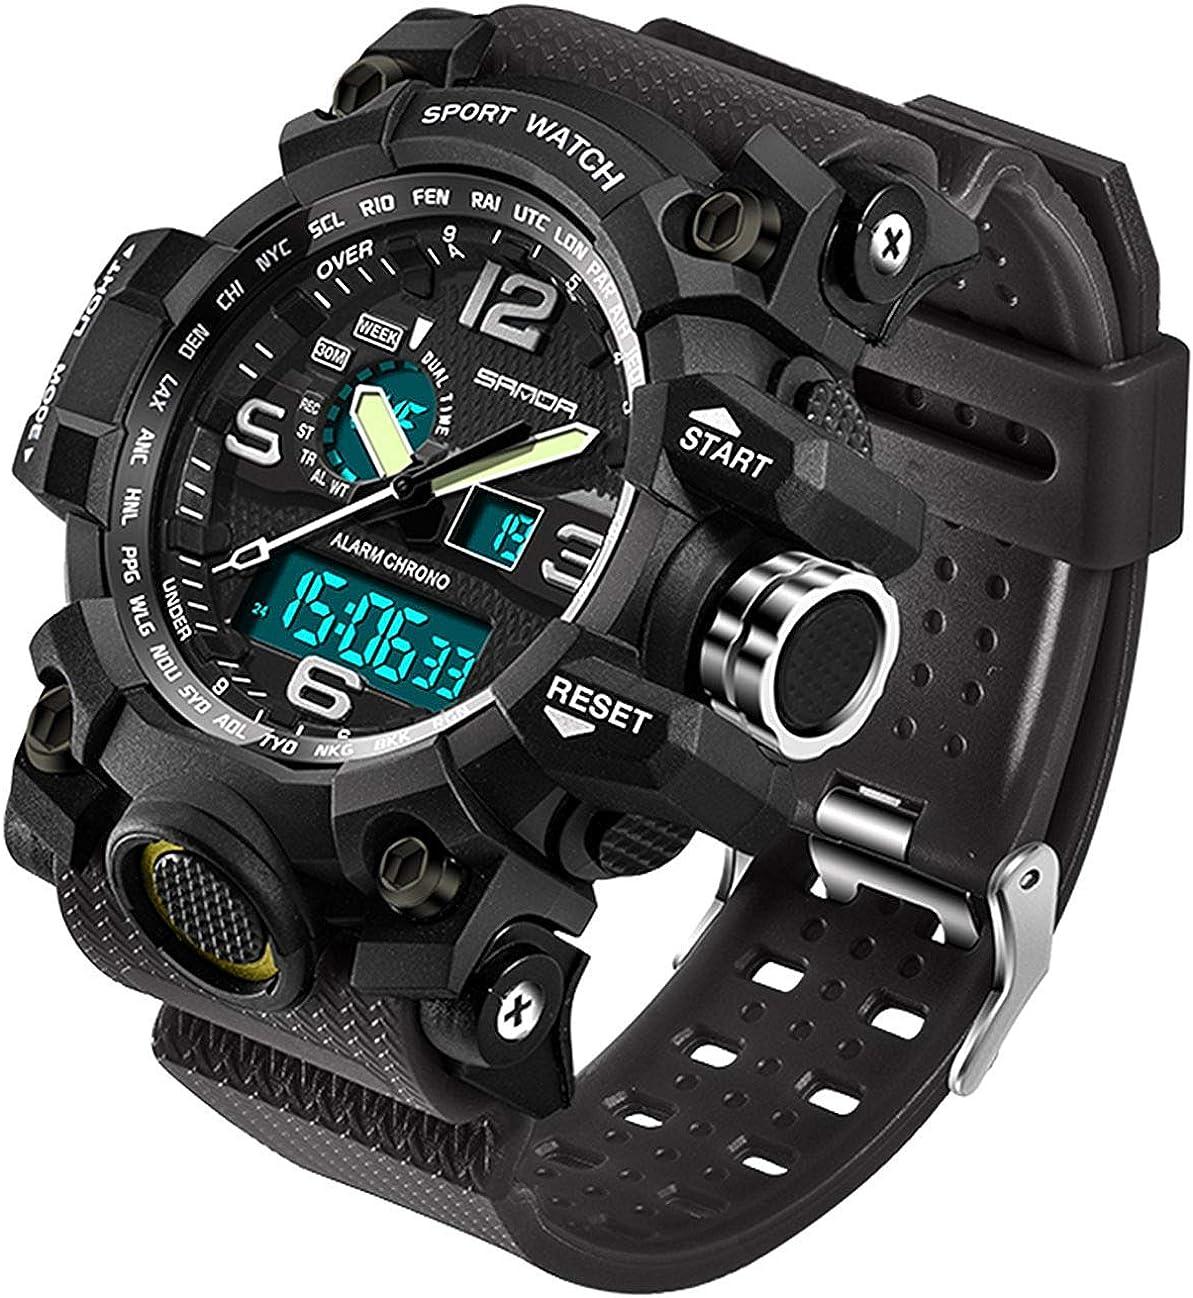 Amazon.com: Mens Military Watch Dual Display Waterproof Sport Digital Big  Wrist Watch Outdoor Army Wristwatch: Watches